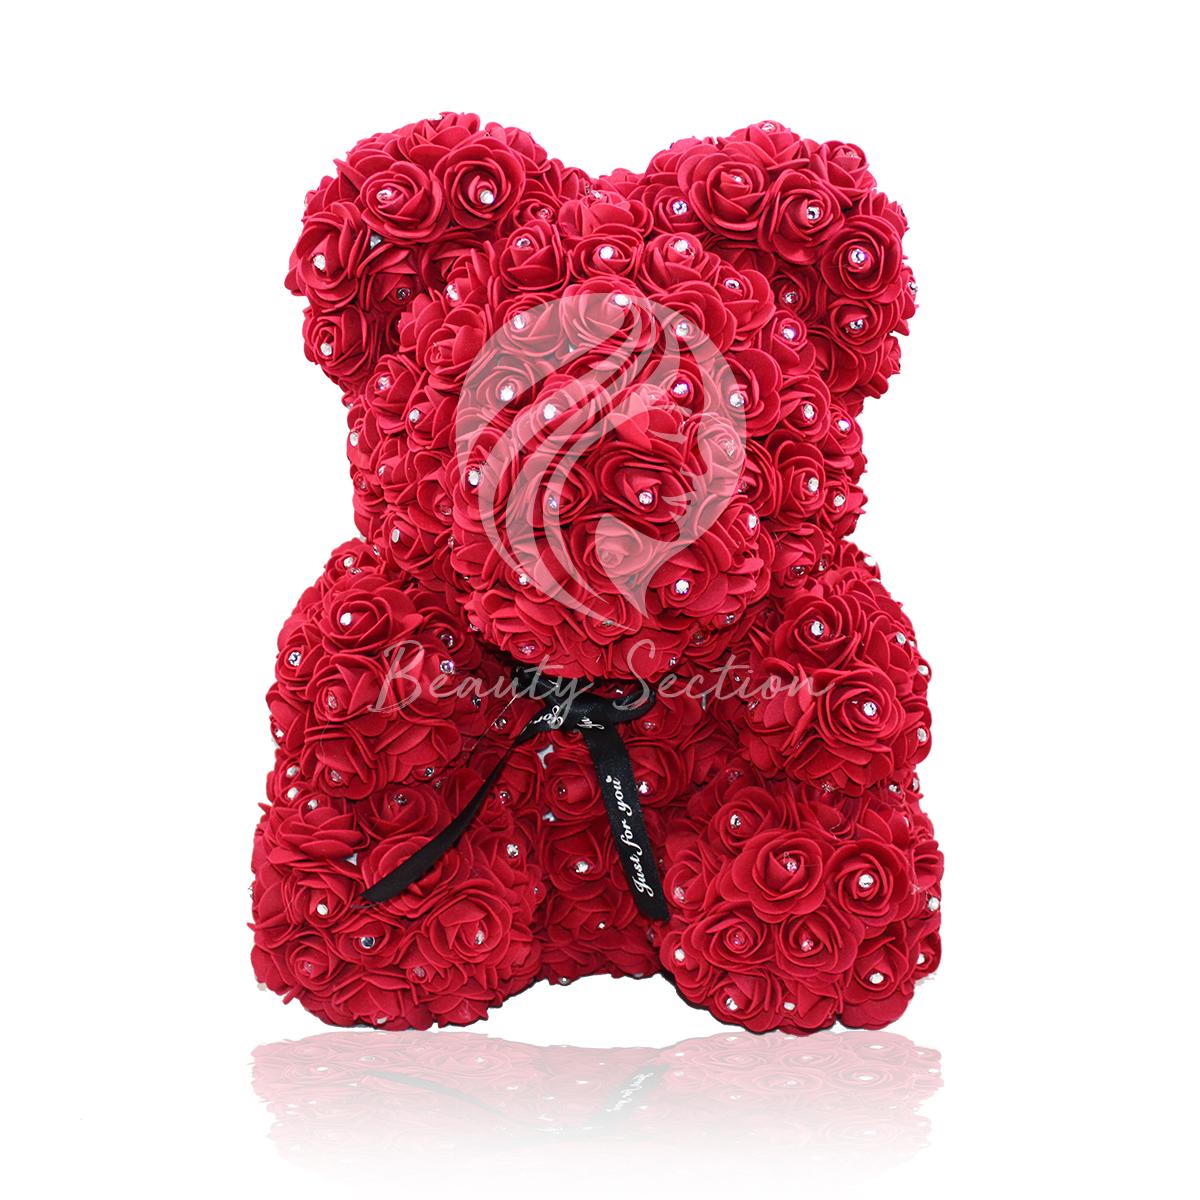 Rosenbär Dunkelrot mit Funkelsteinen 40cm